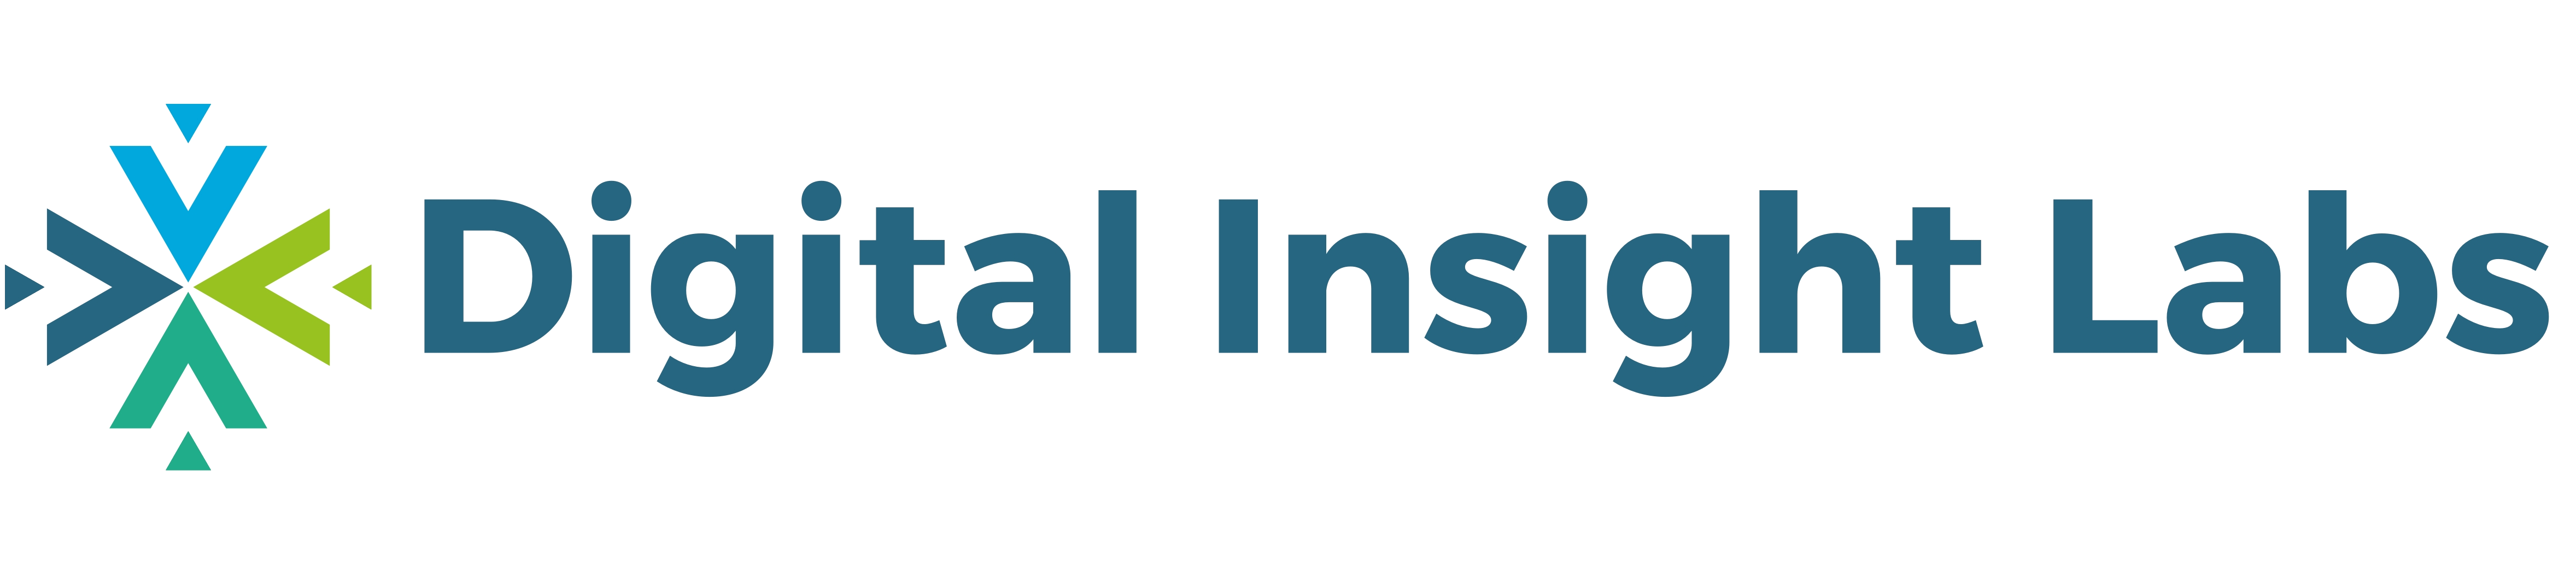 Digital Insight Labs